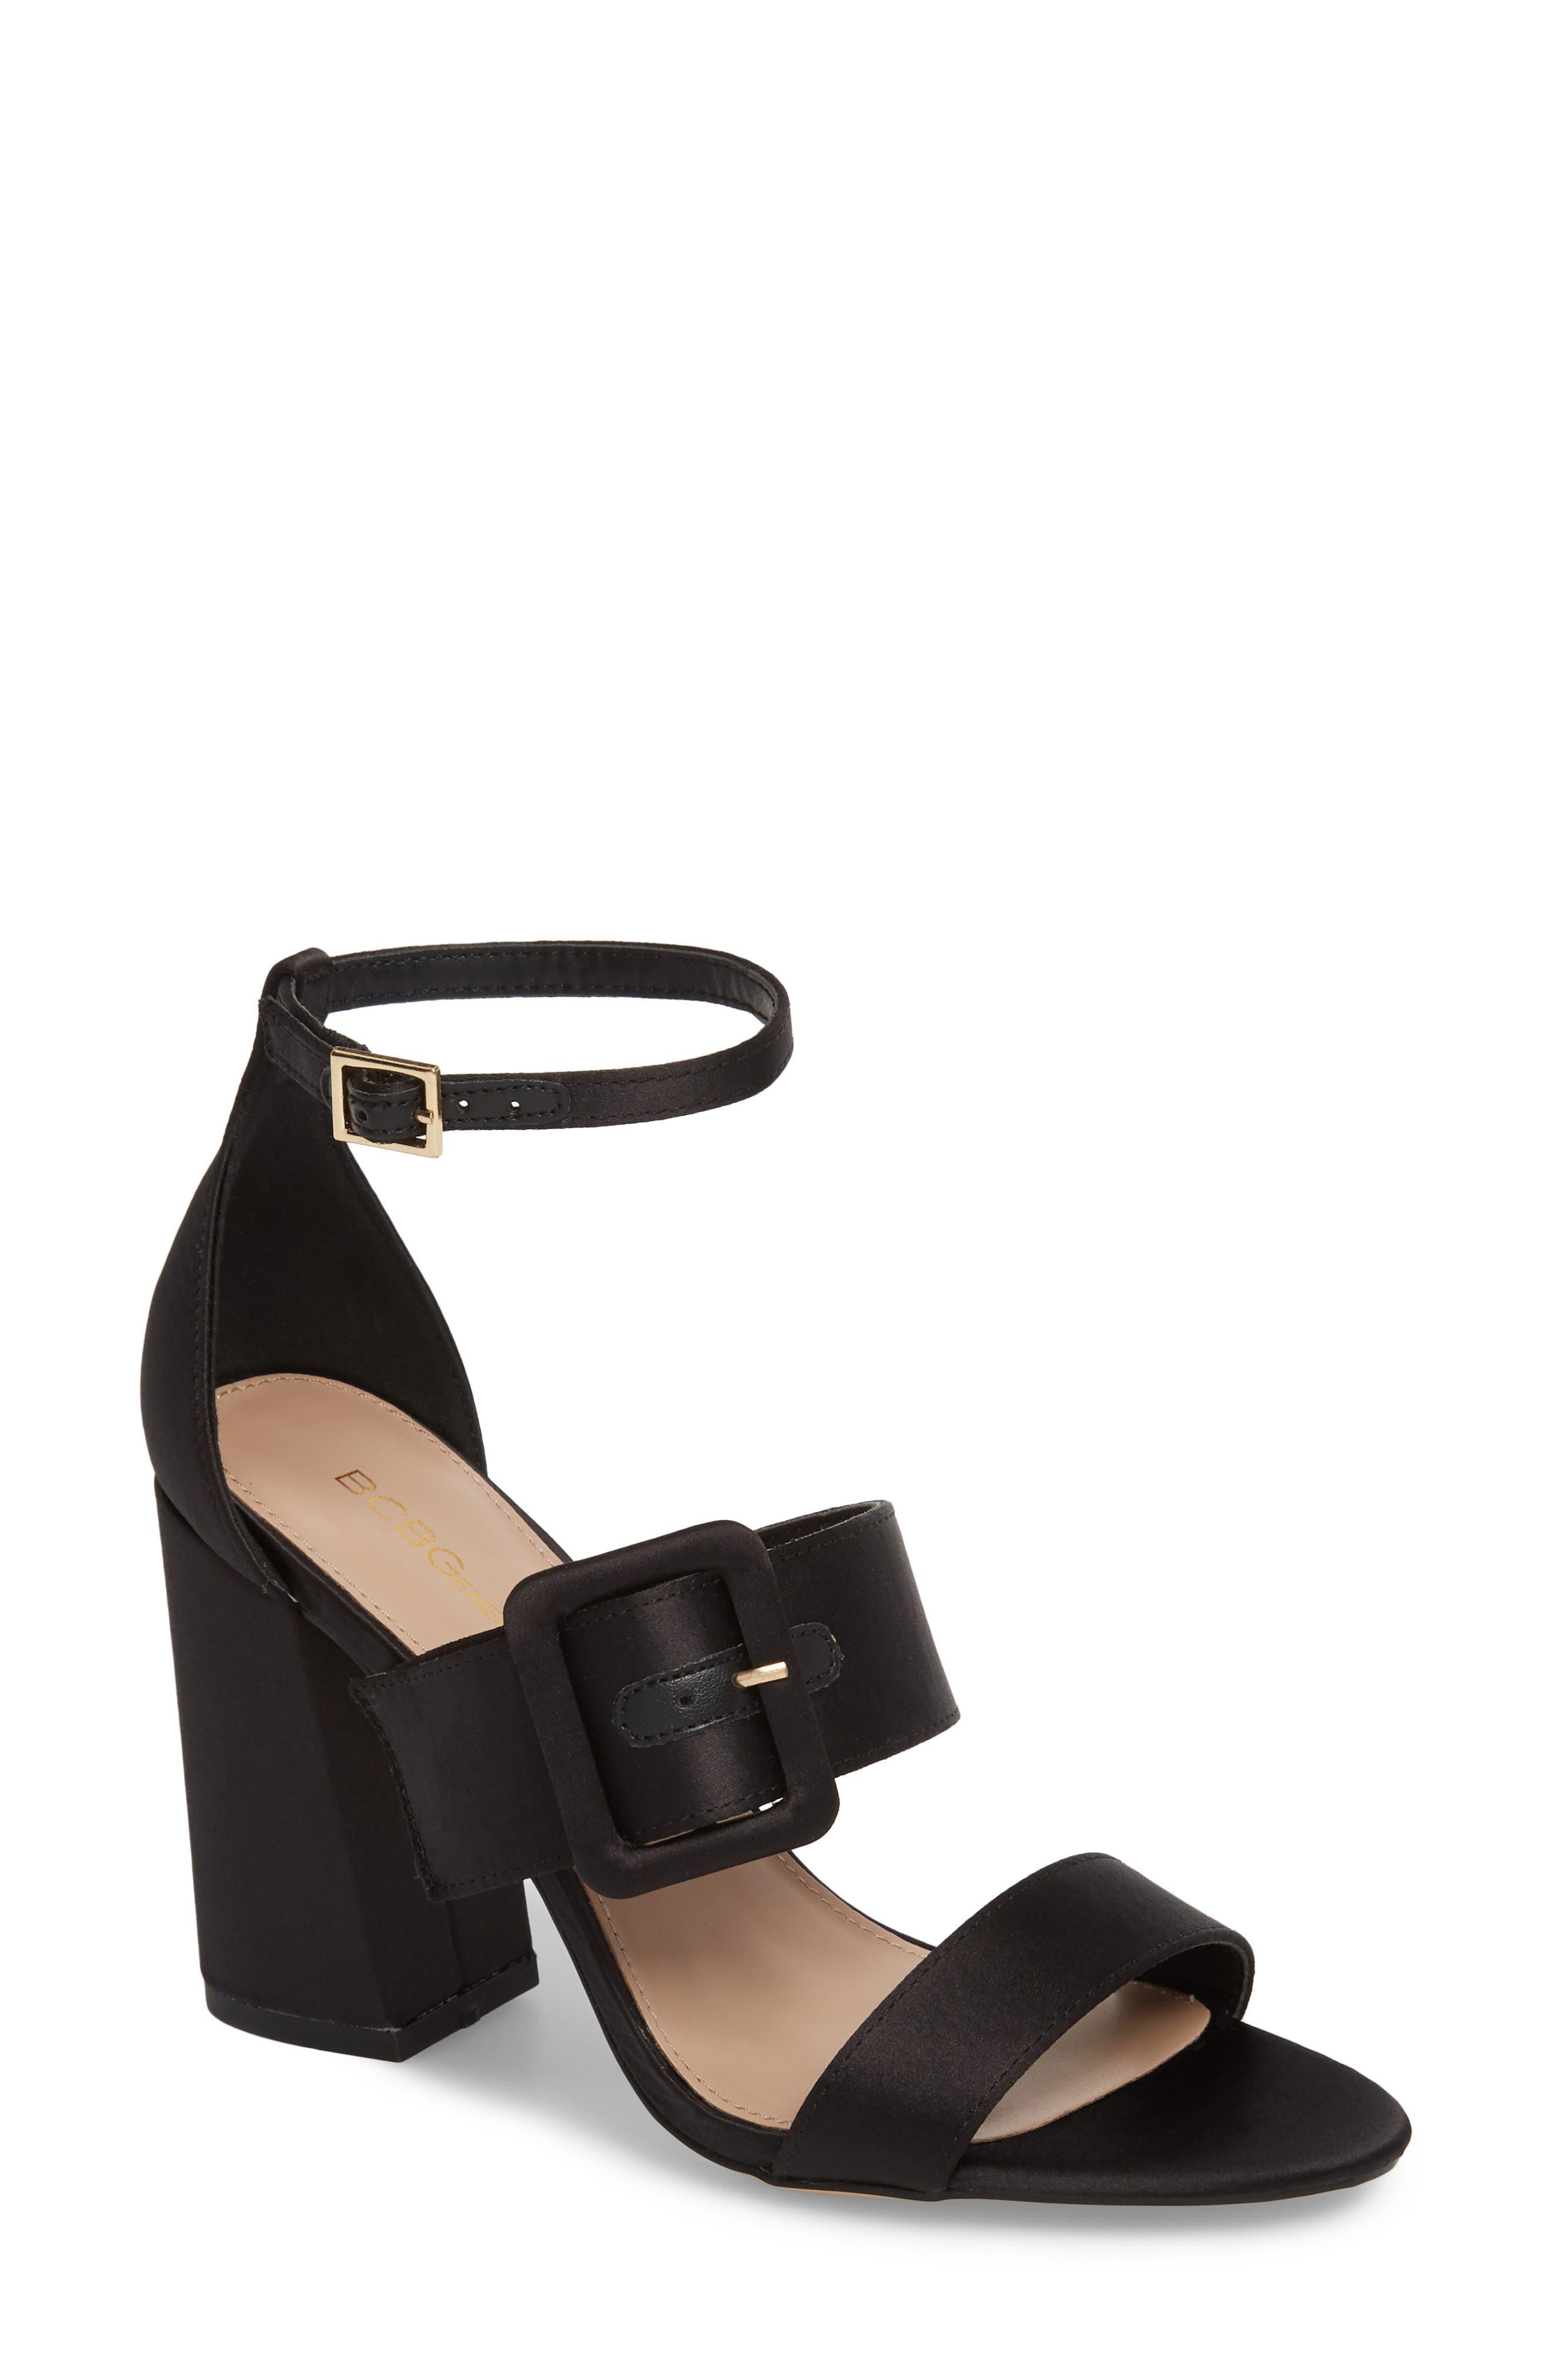 Raelynn Ankle Strap Sandal,                         Main,                         color, BLACK SATIN